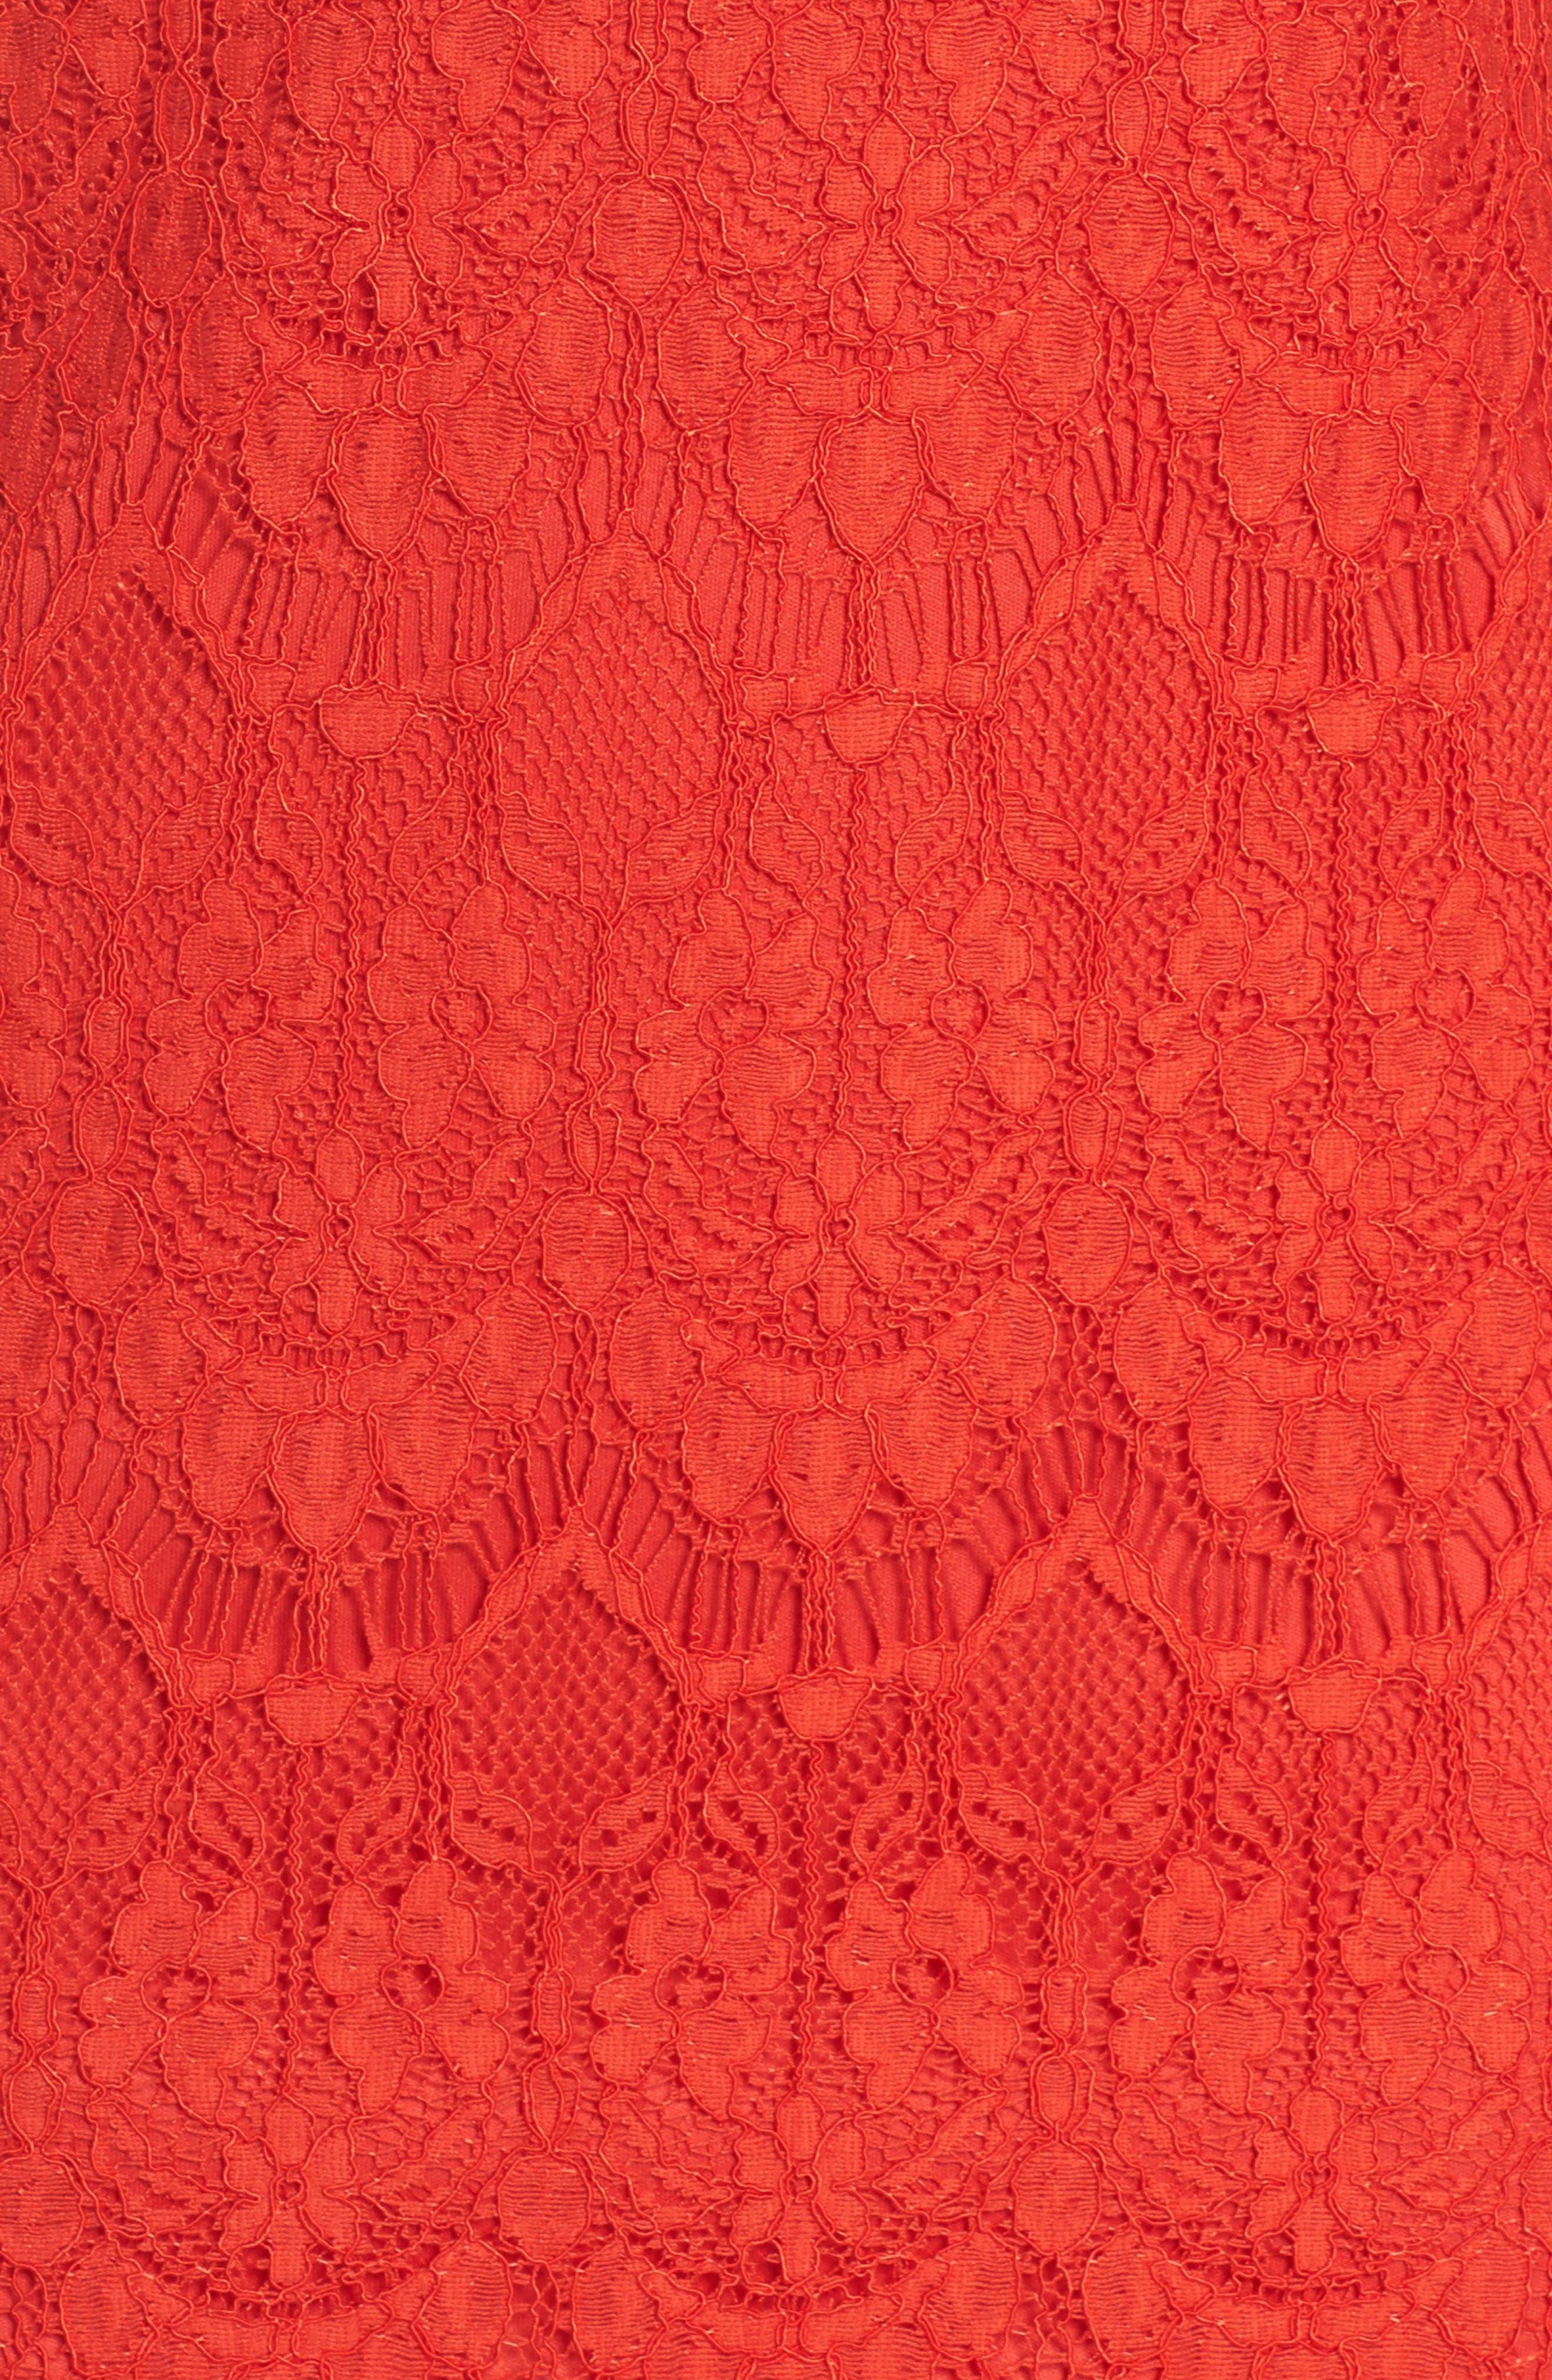 Lace Sheath Dress,                             Alternate thumbnail 5, color,                             640